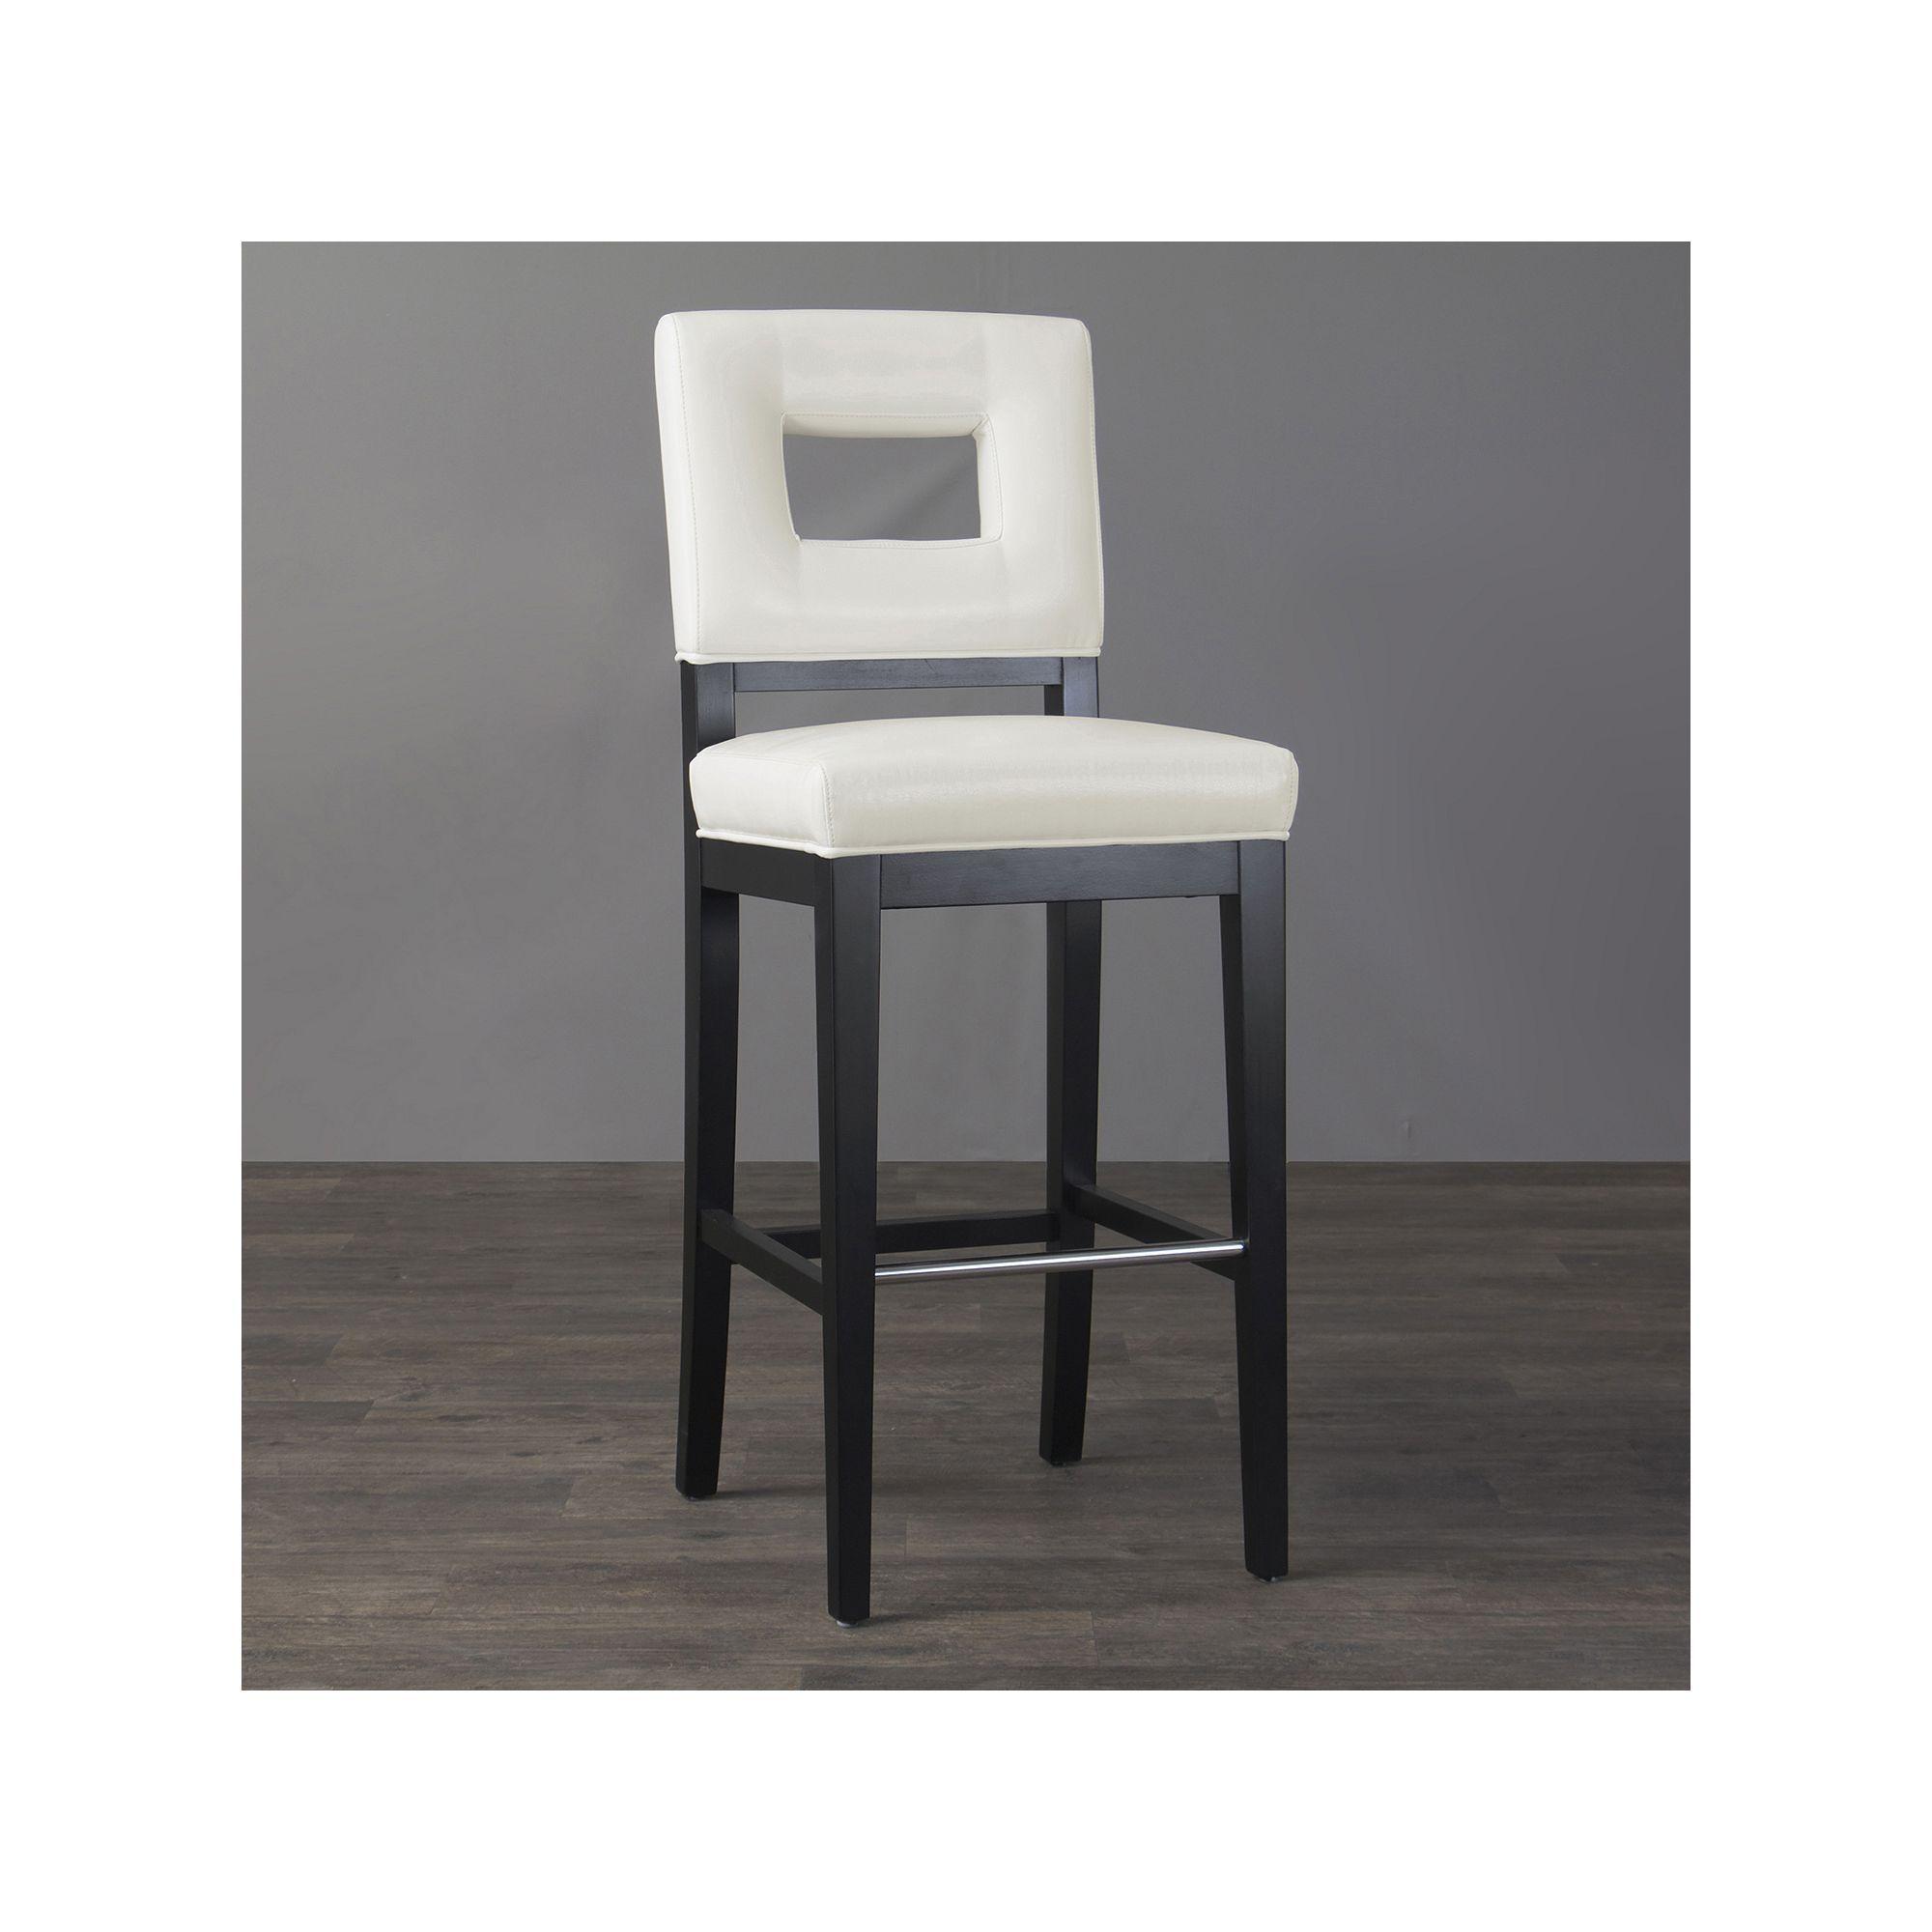 Baxton studio faustino leather bar stool white durable